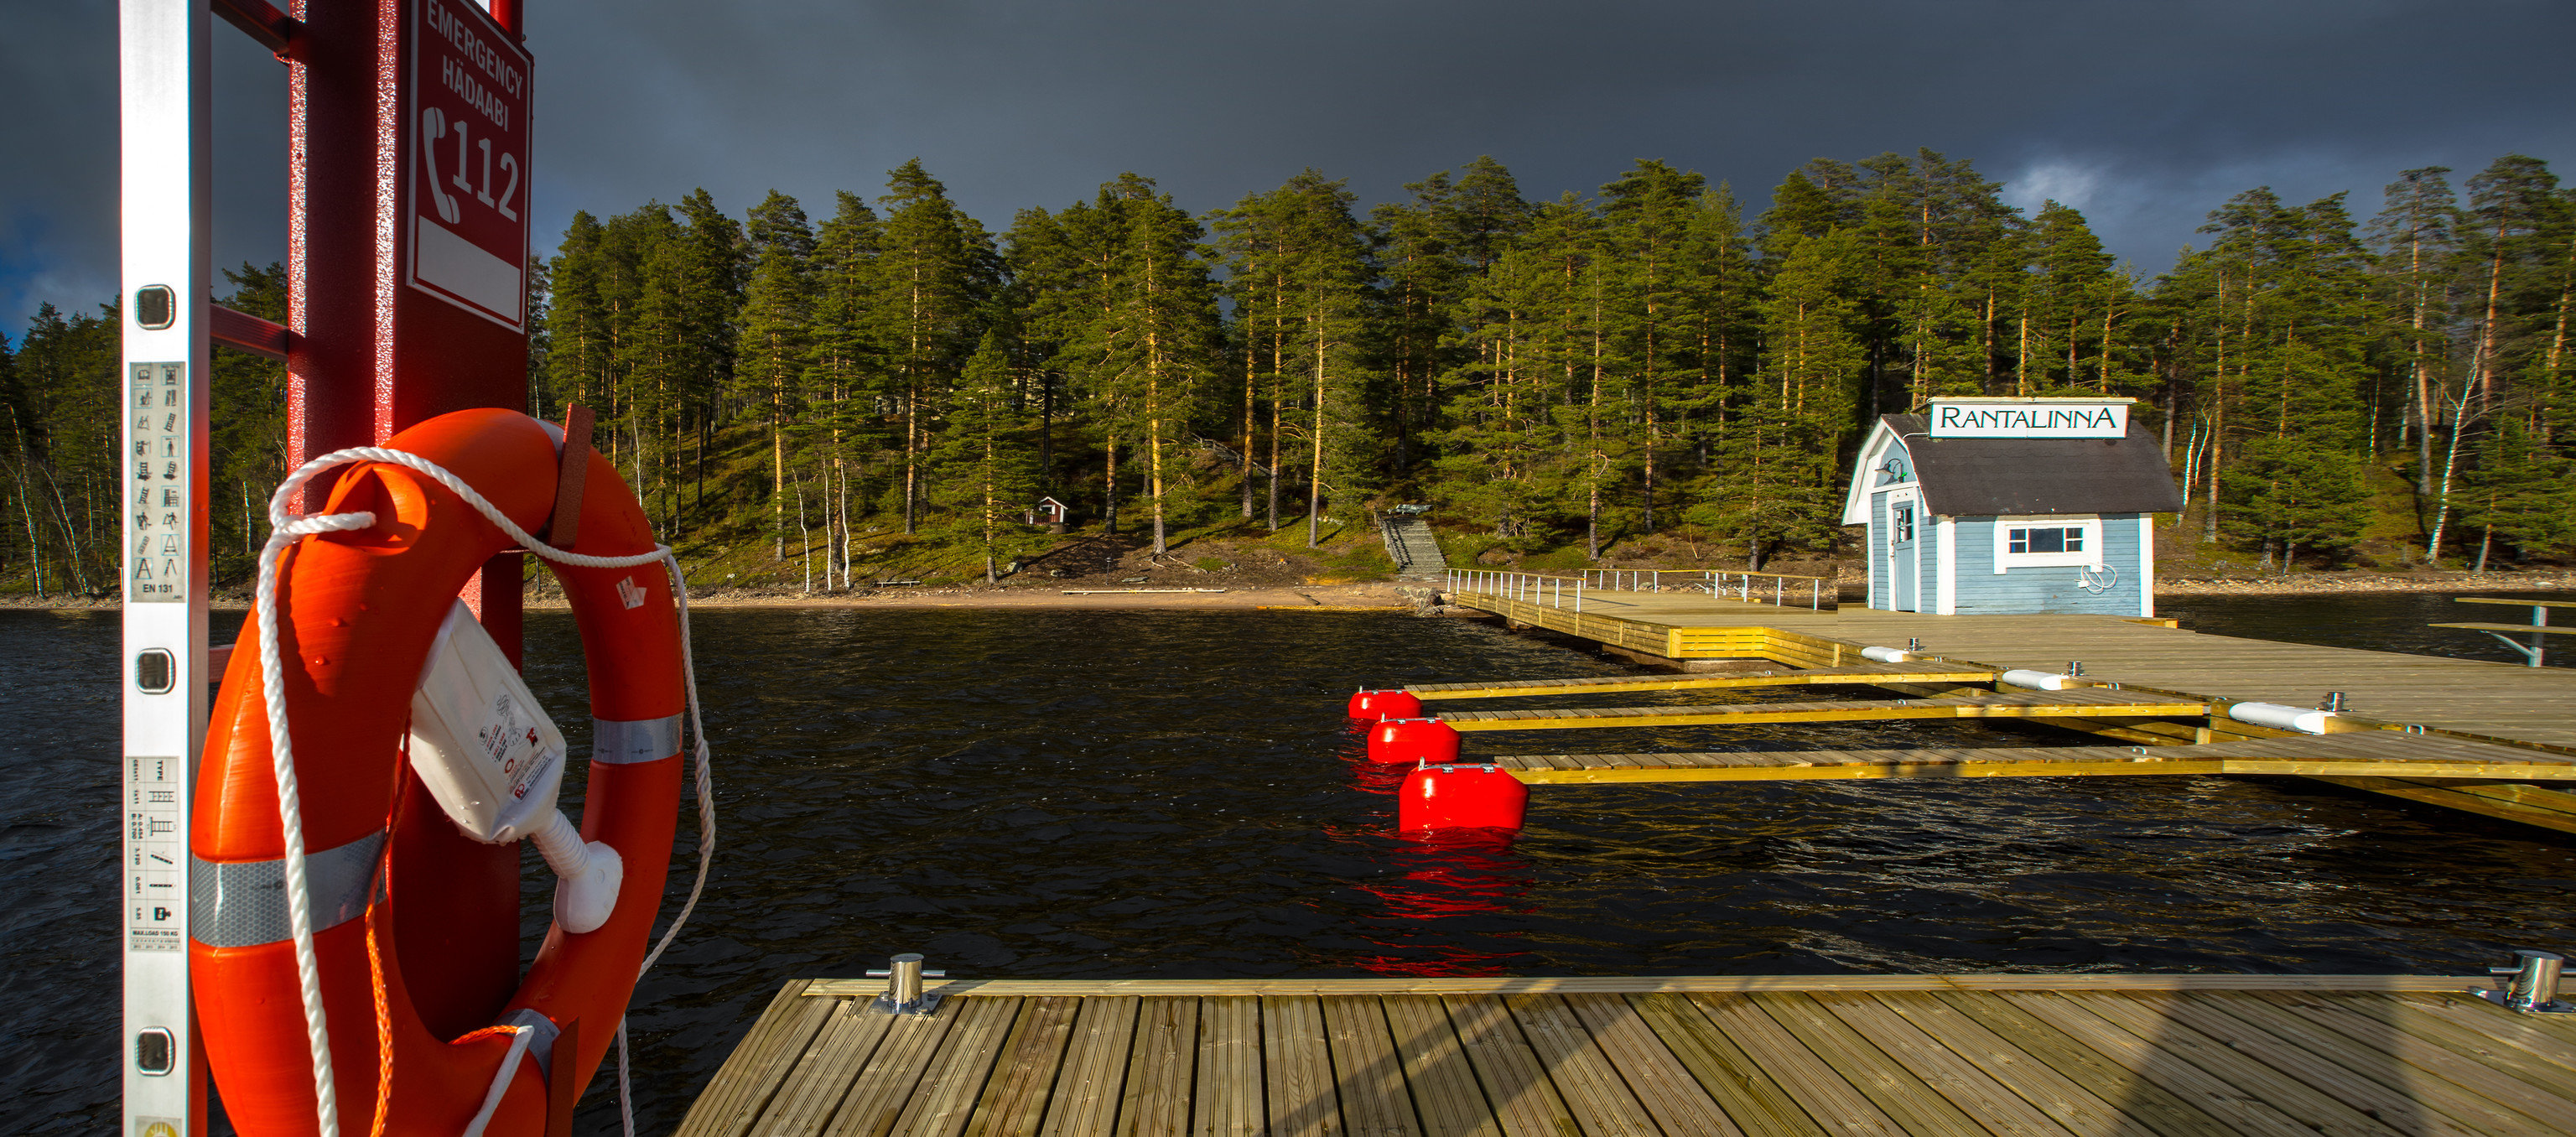 Denmark Finland Hotels Landmarks Luxury Travel Sweden outdoor tree water reflection vehicle dock plant recreation leisure Boat